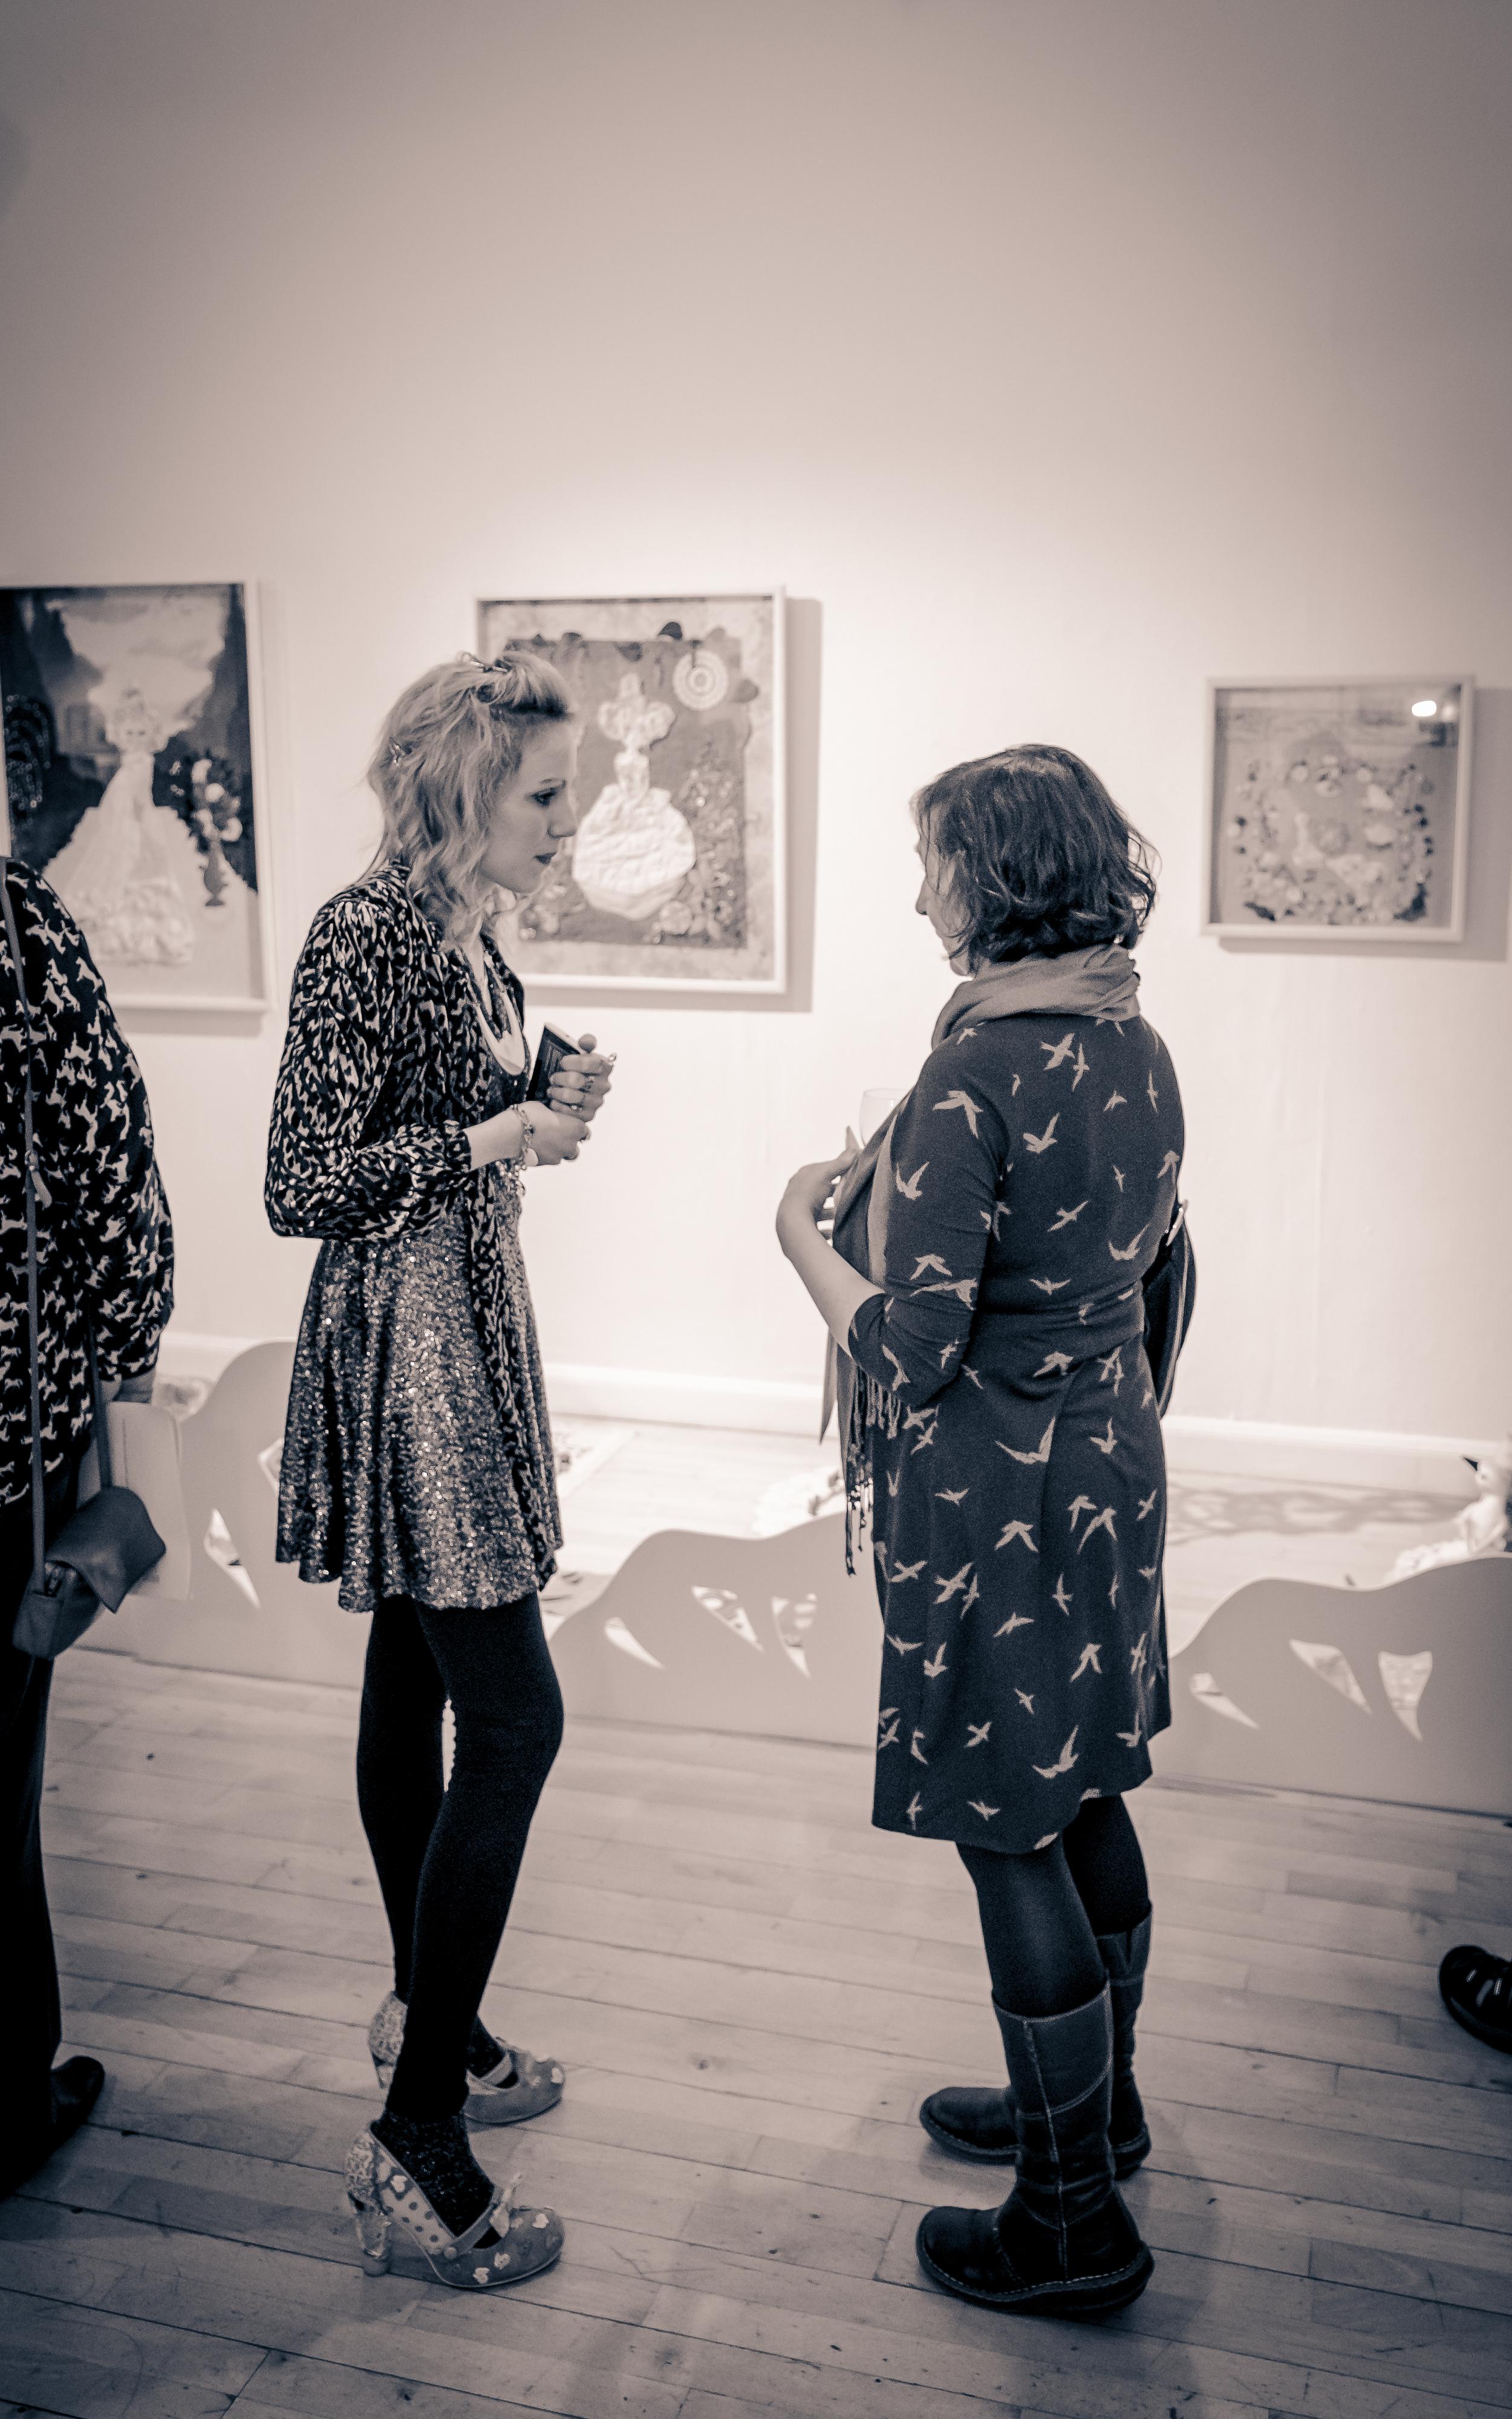 'In Dreams' Exhibition opening night - 2013